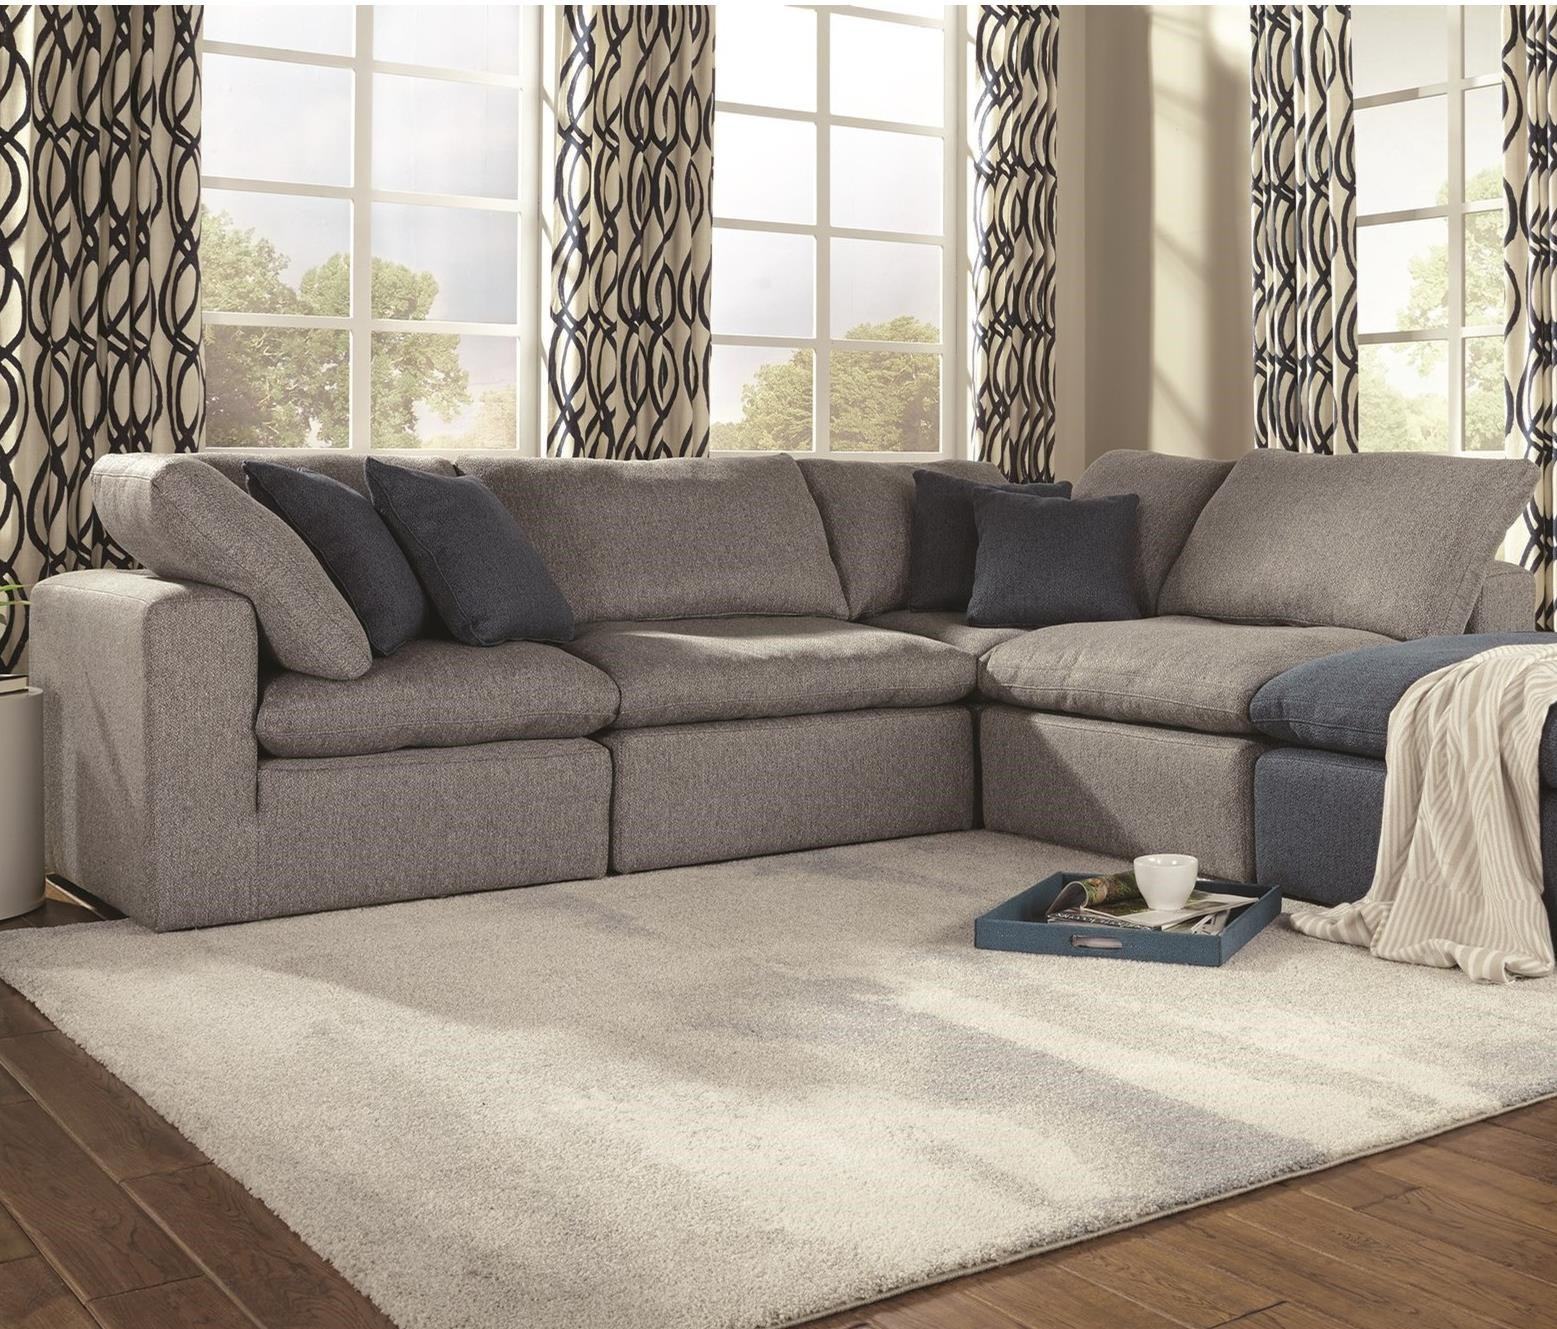 Incredible Palliser Bloom Casual 4 Seat Sectional Sofa With Reversible Creativecarmelina Interior Chair Design Creativecarmelinacom